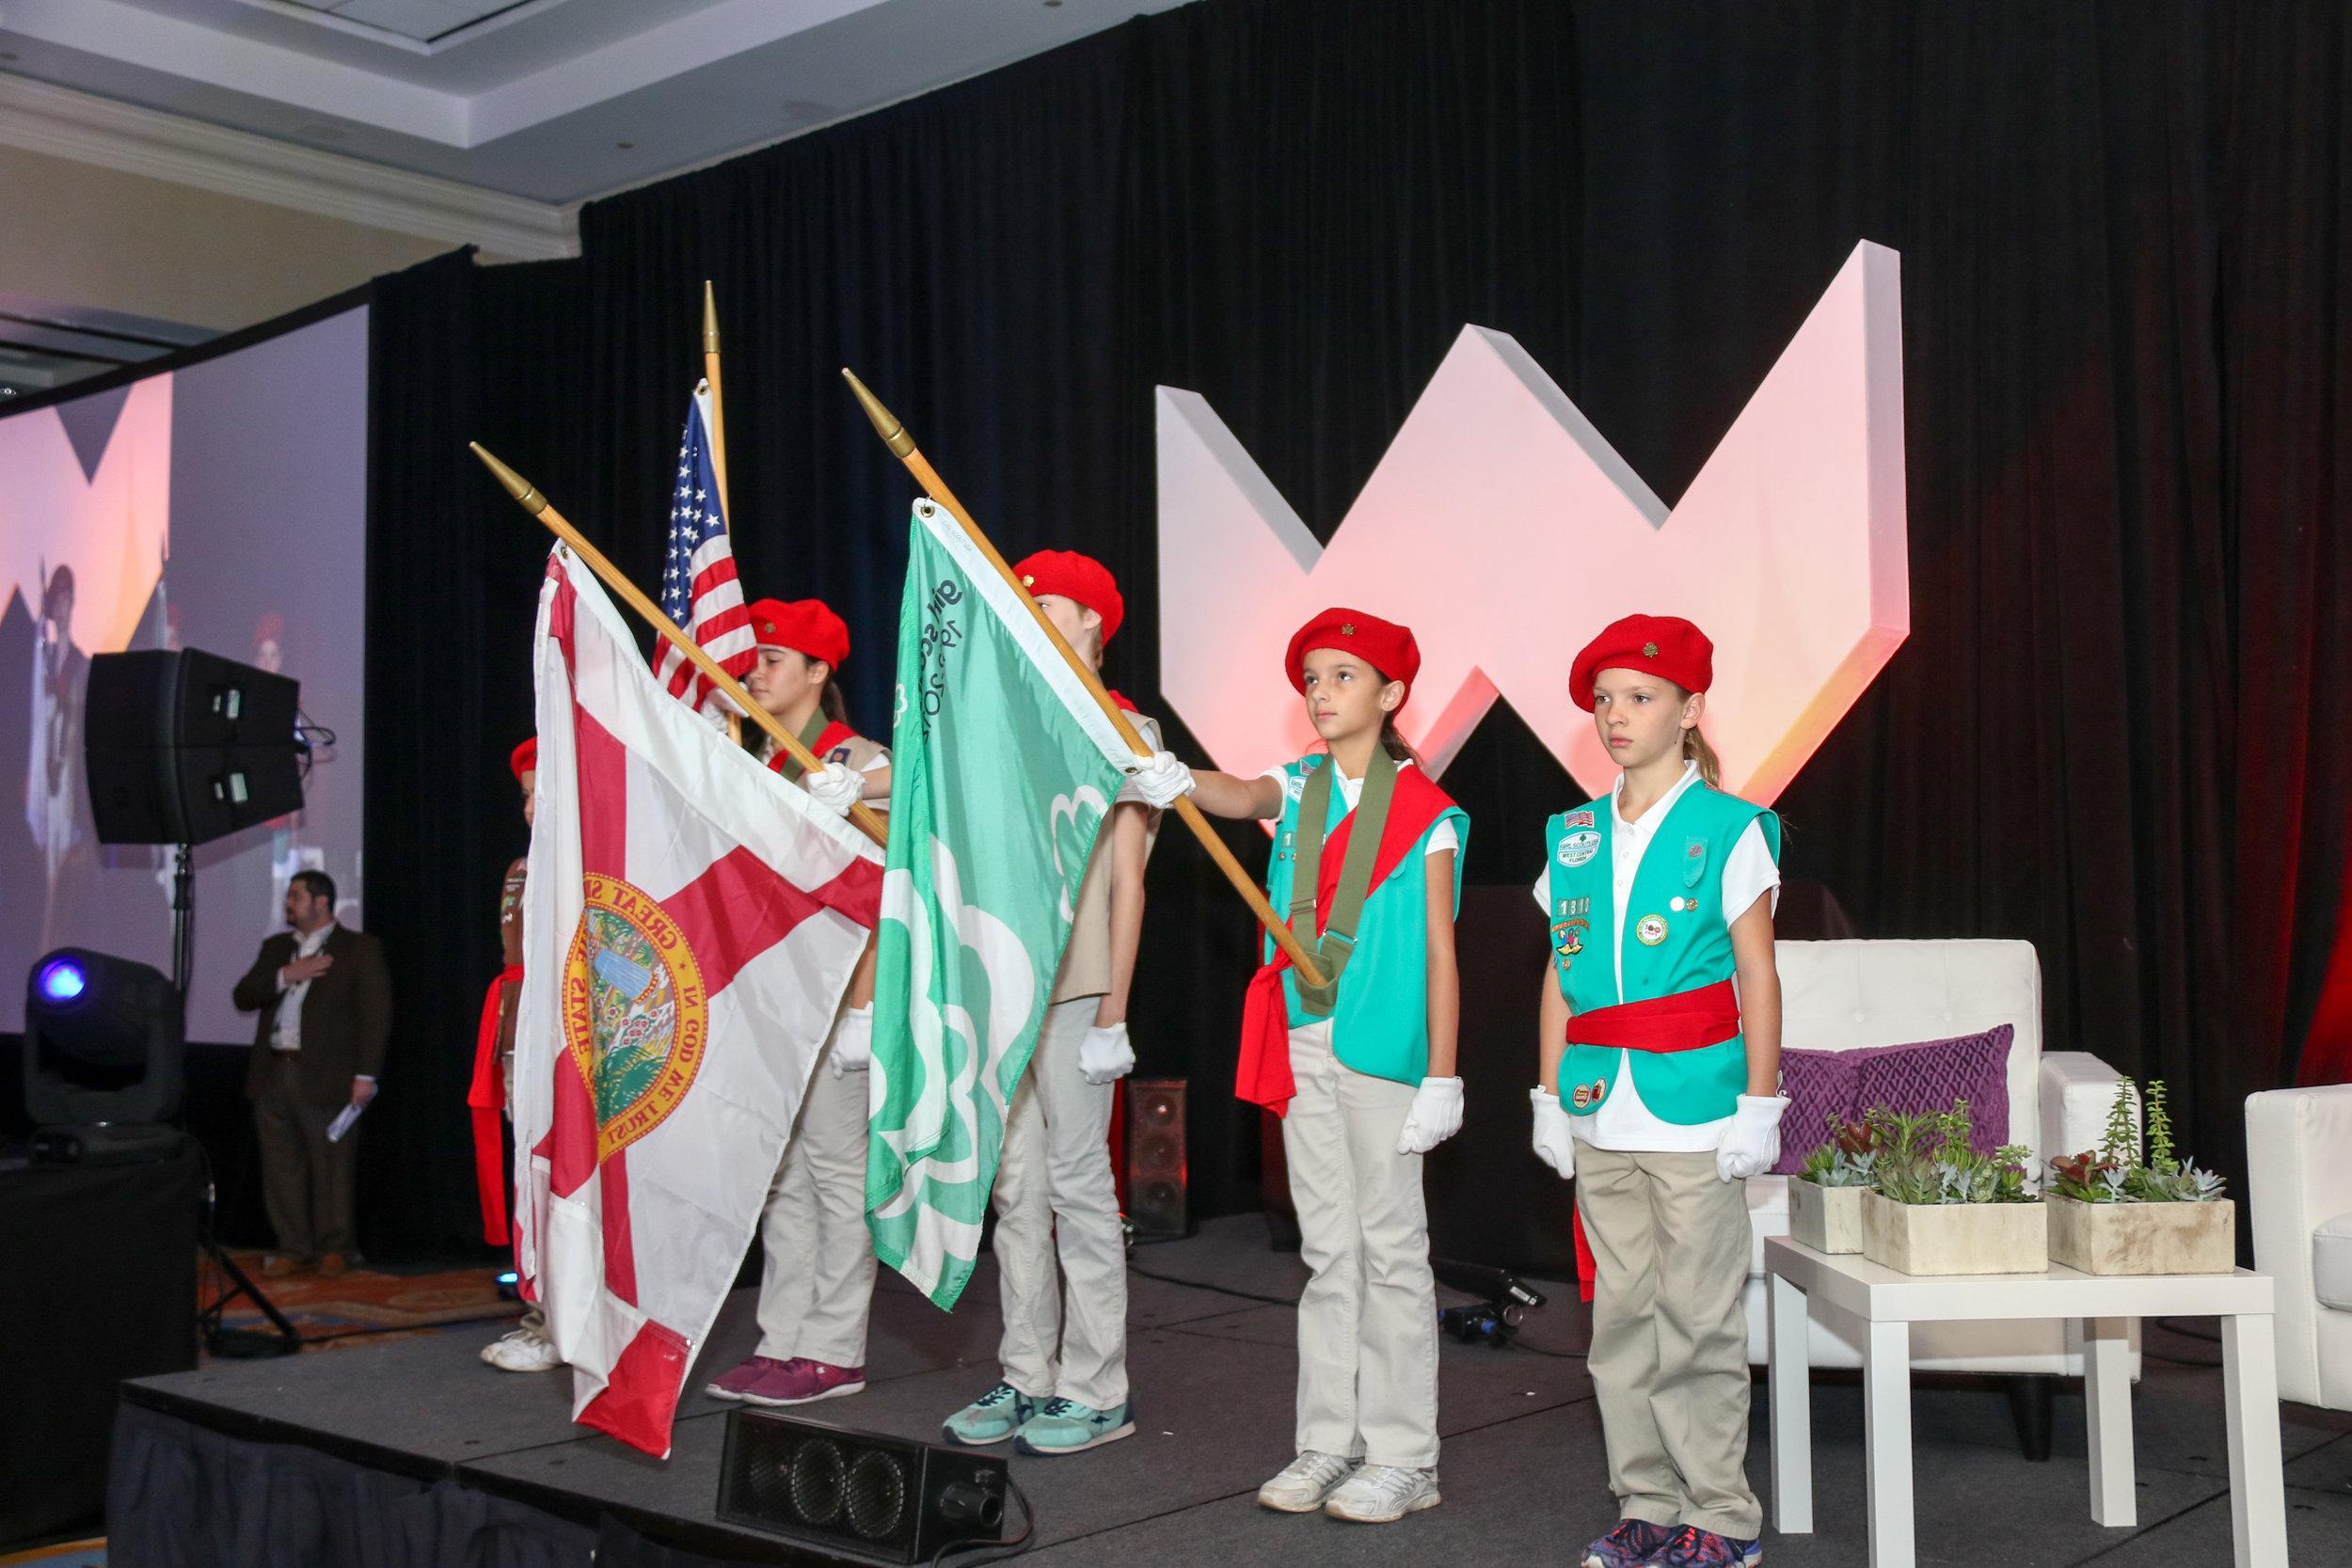 084_WomensConference_10-26-17.jpg